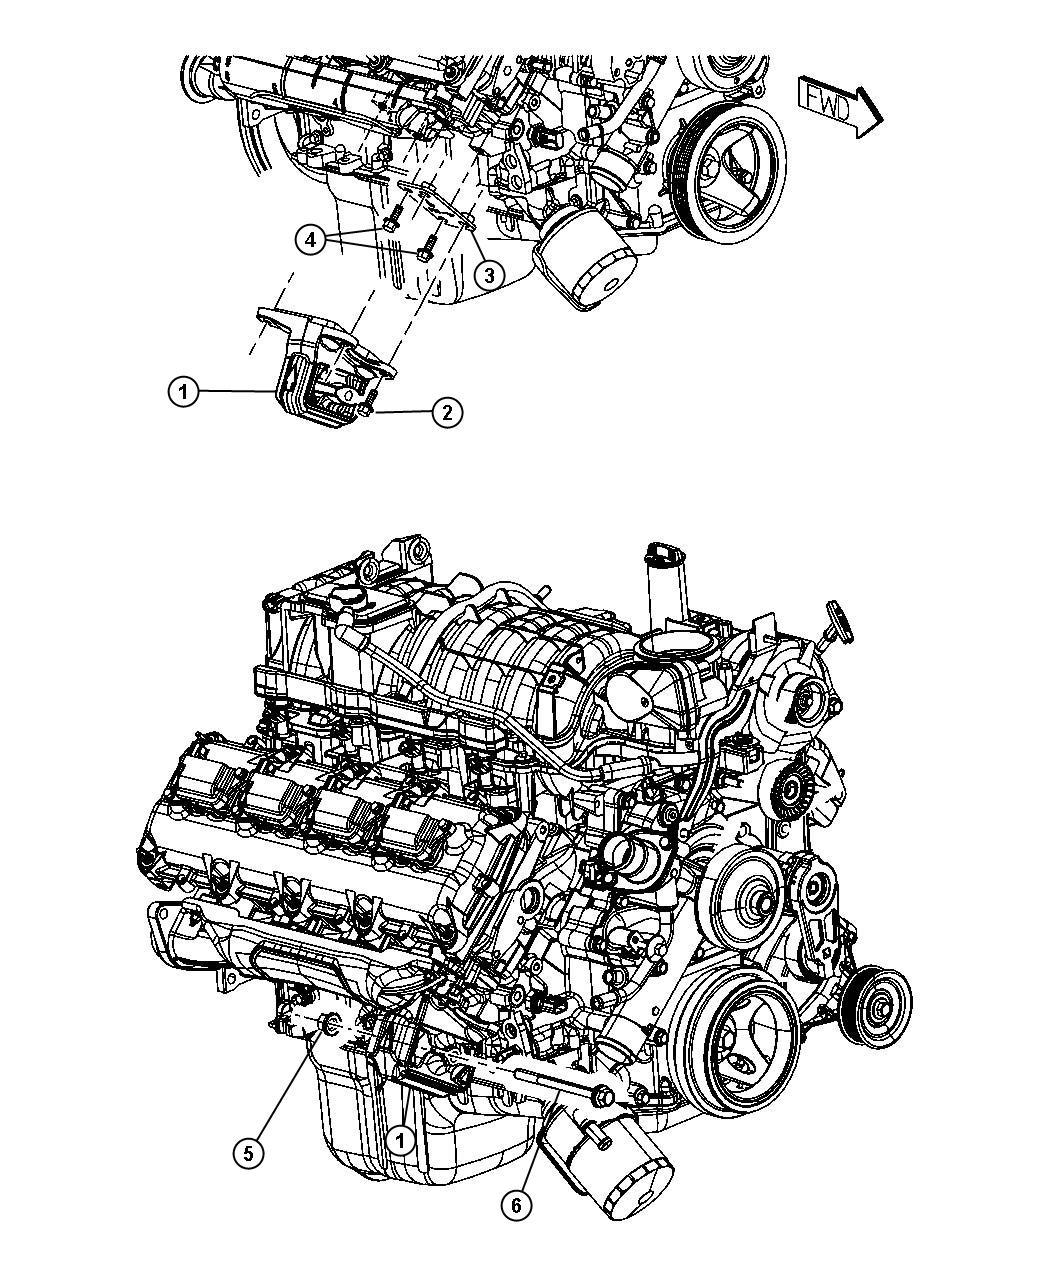 RAM 5500 Bracket. Engine mount. Right, right side. [mega